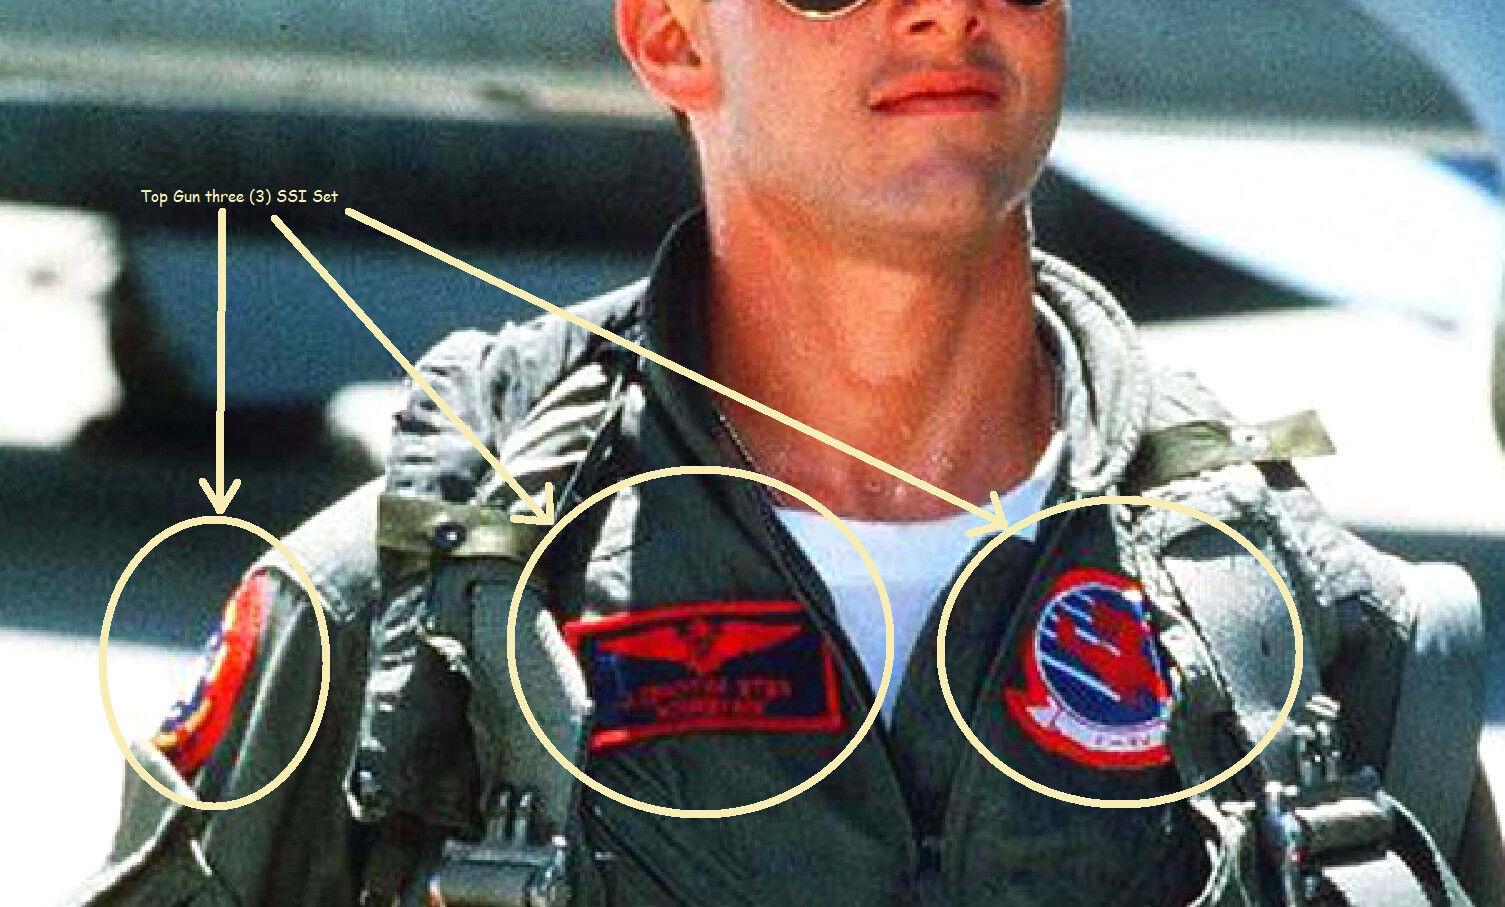 as seen on movie topgun top gun pete mitchell flight suit